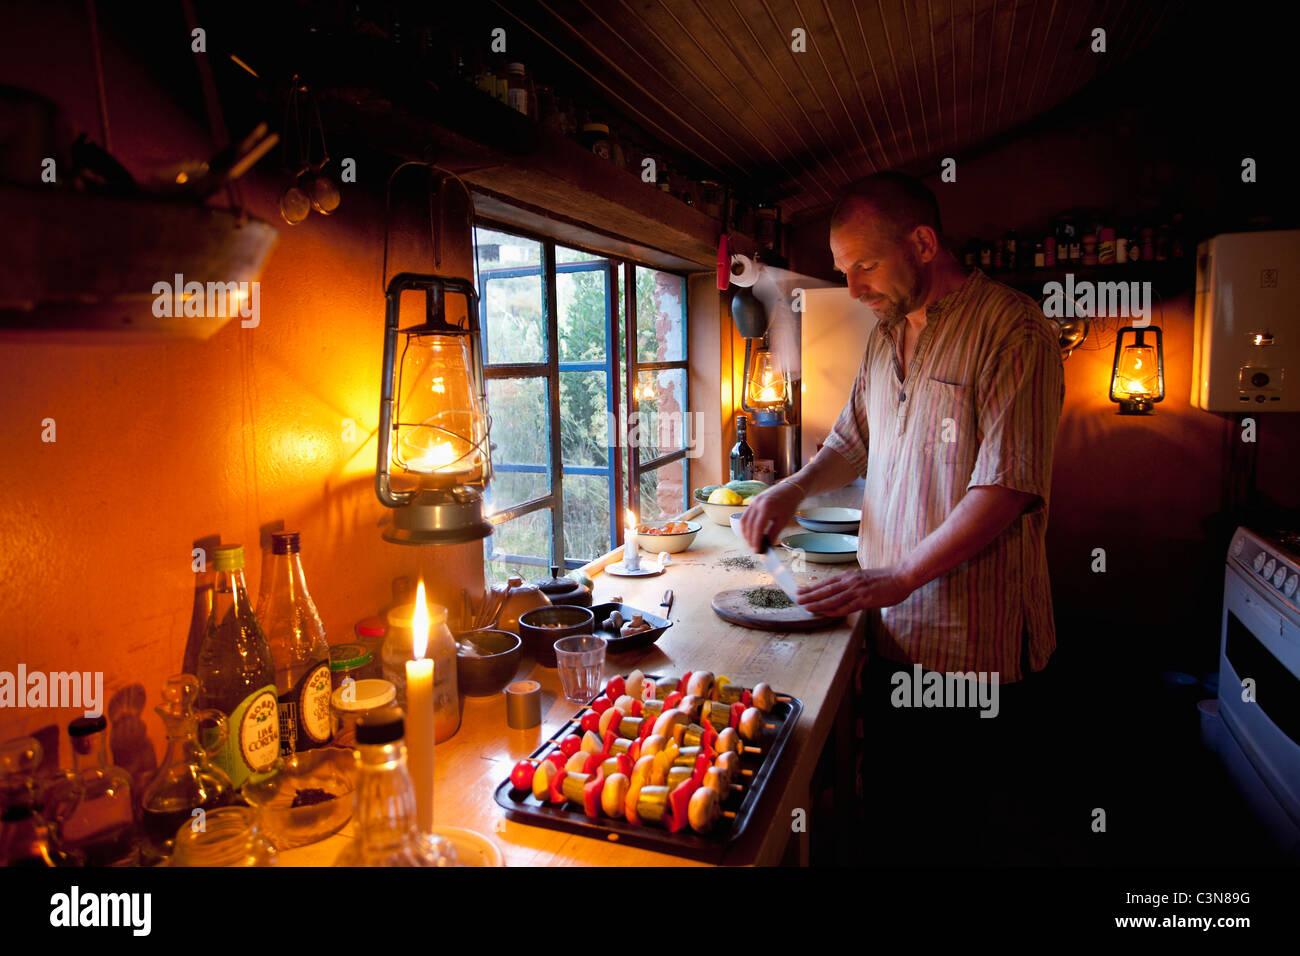 South Africa, Western Cape, Montagu, Simonskloof Mountain Retreat. Owner and host Jurgen Wohlfarter preparing food. - Stock Image